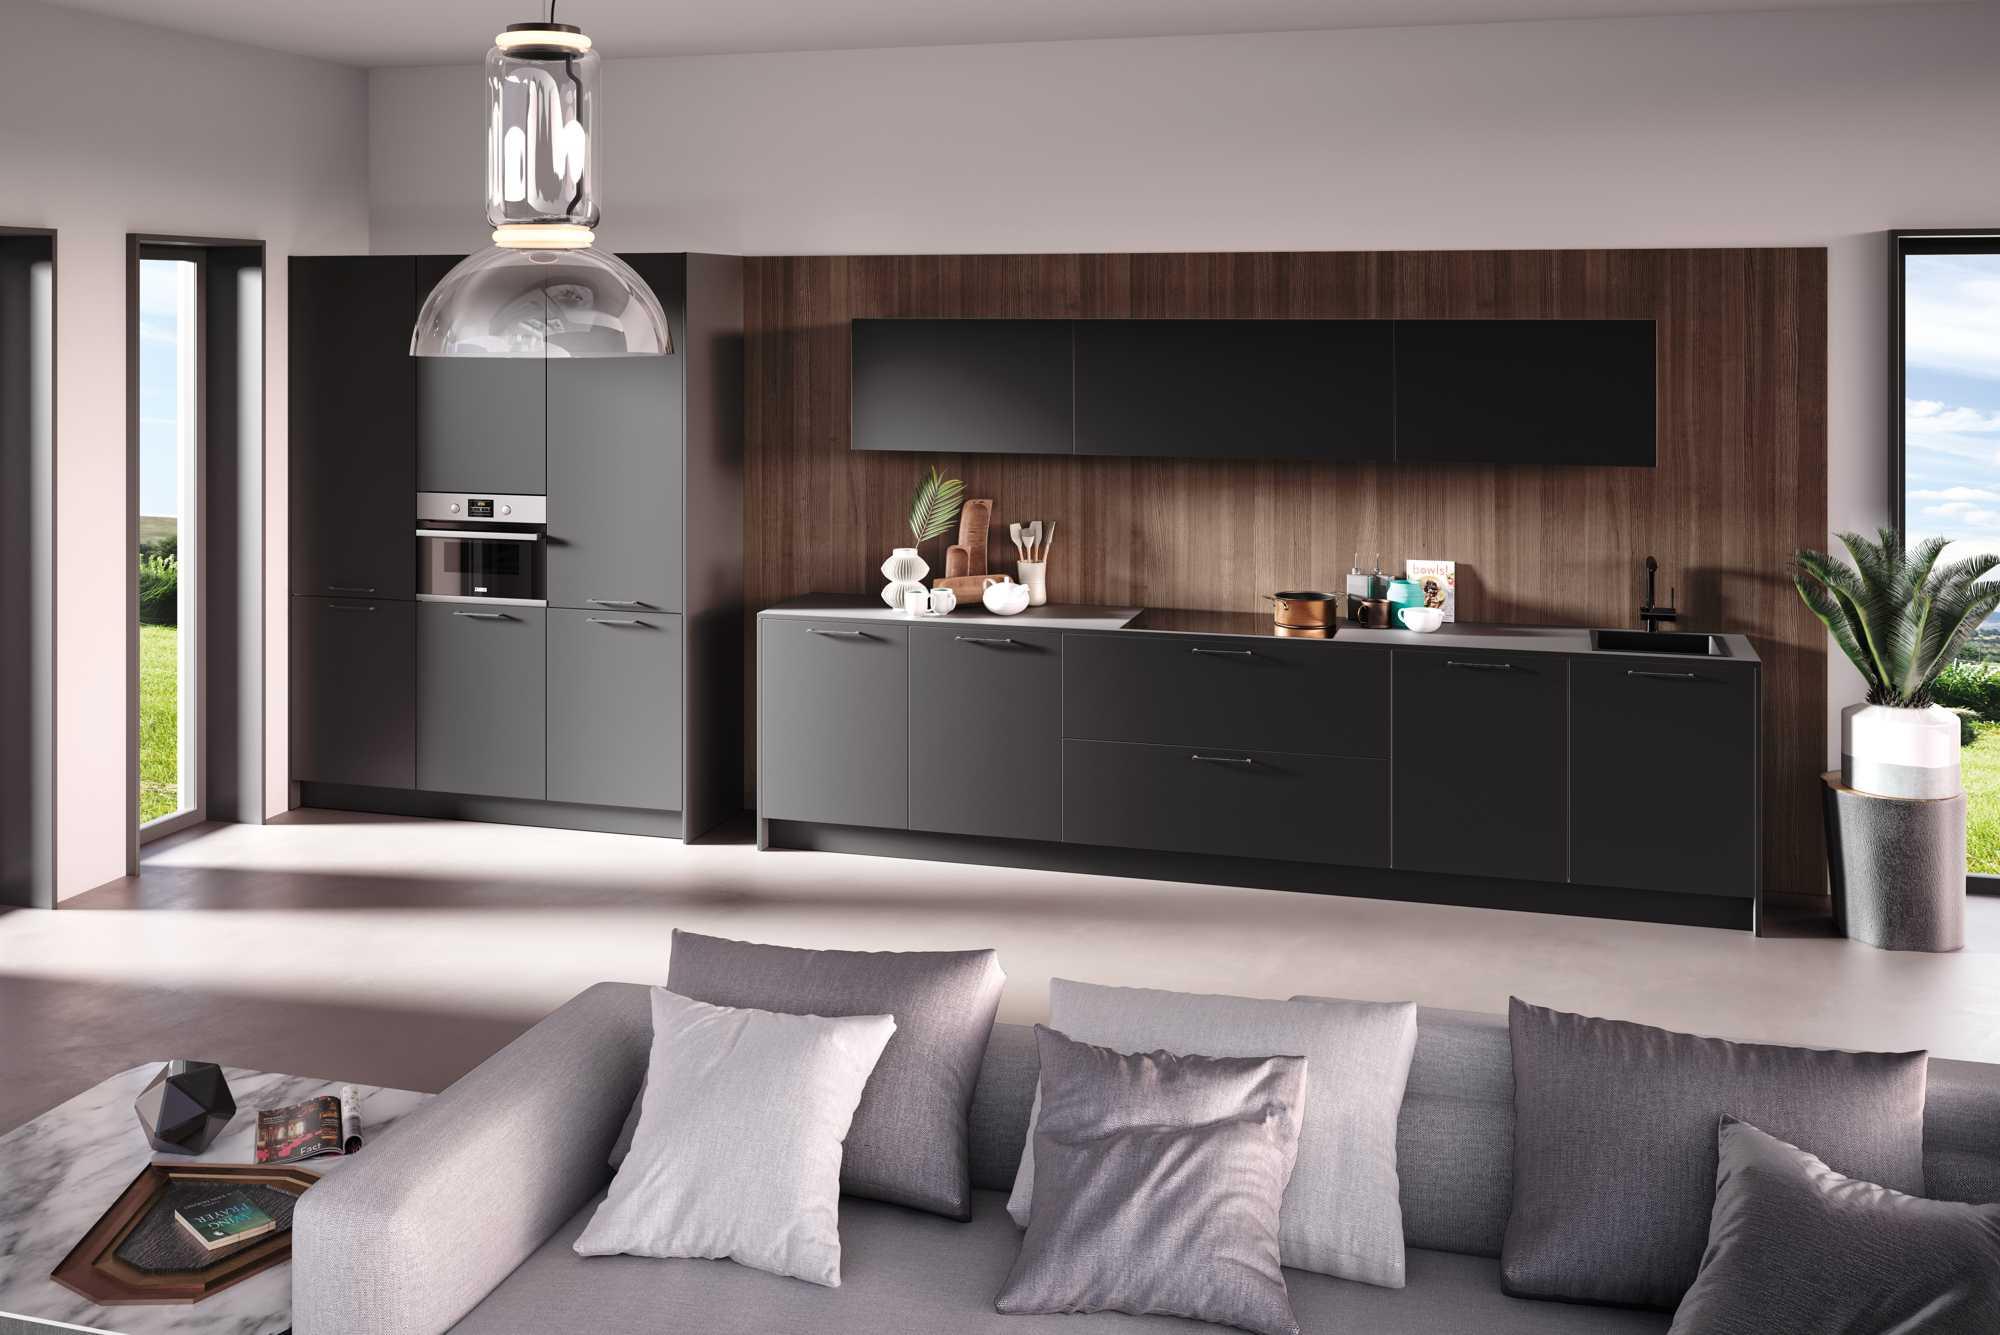 German ZeroxHPL XT Black Kitchen with Grigio Bow Handle